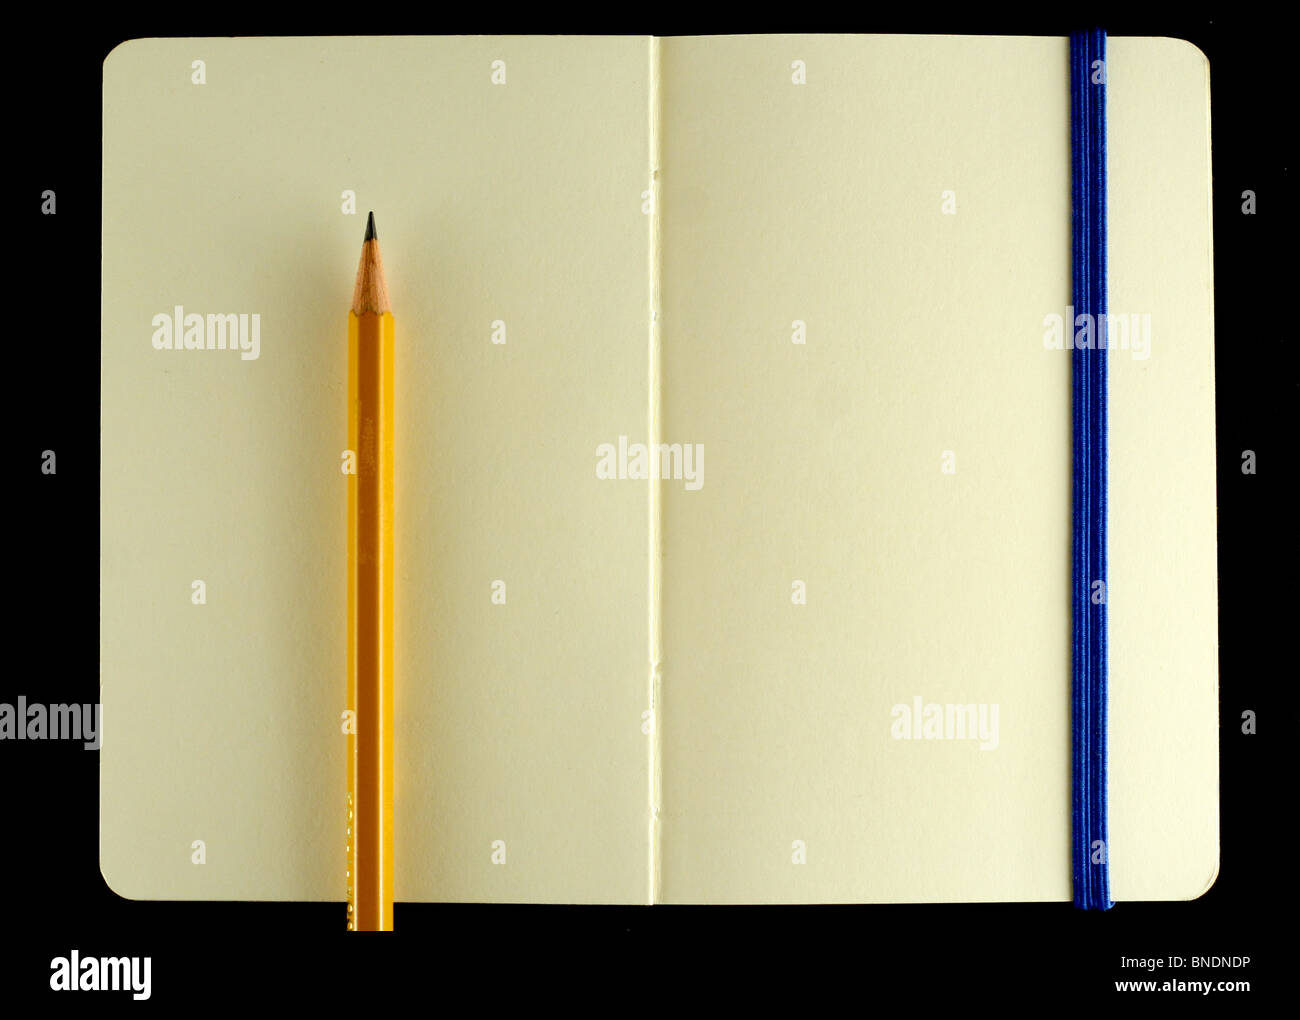 Moleskin Stockfotos & Moleskin Bilder - Alamy